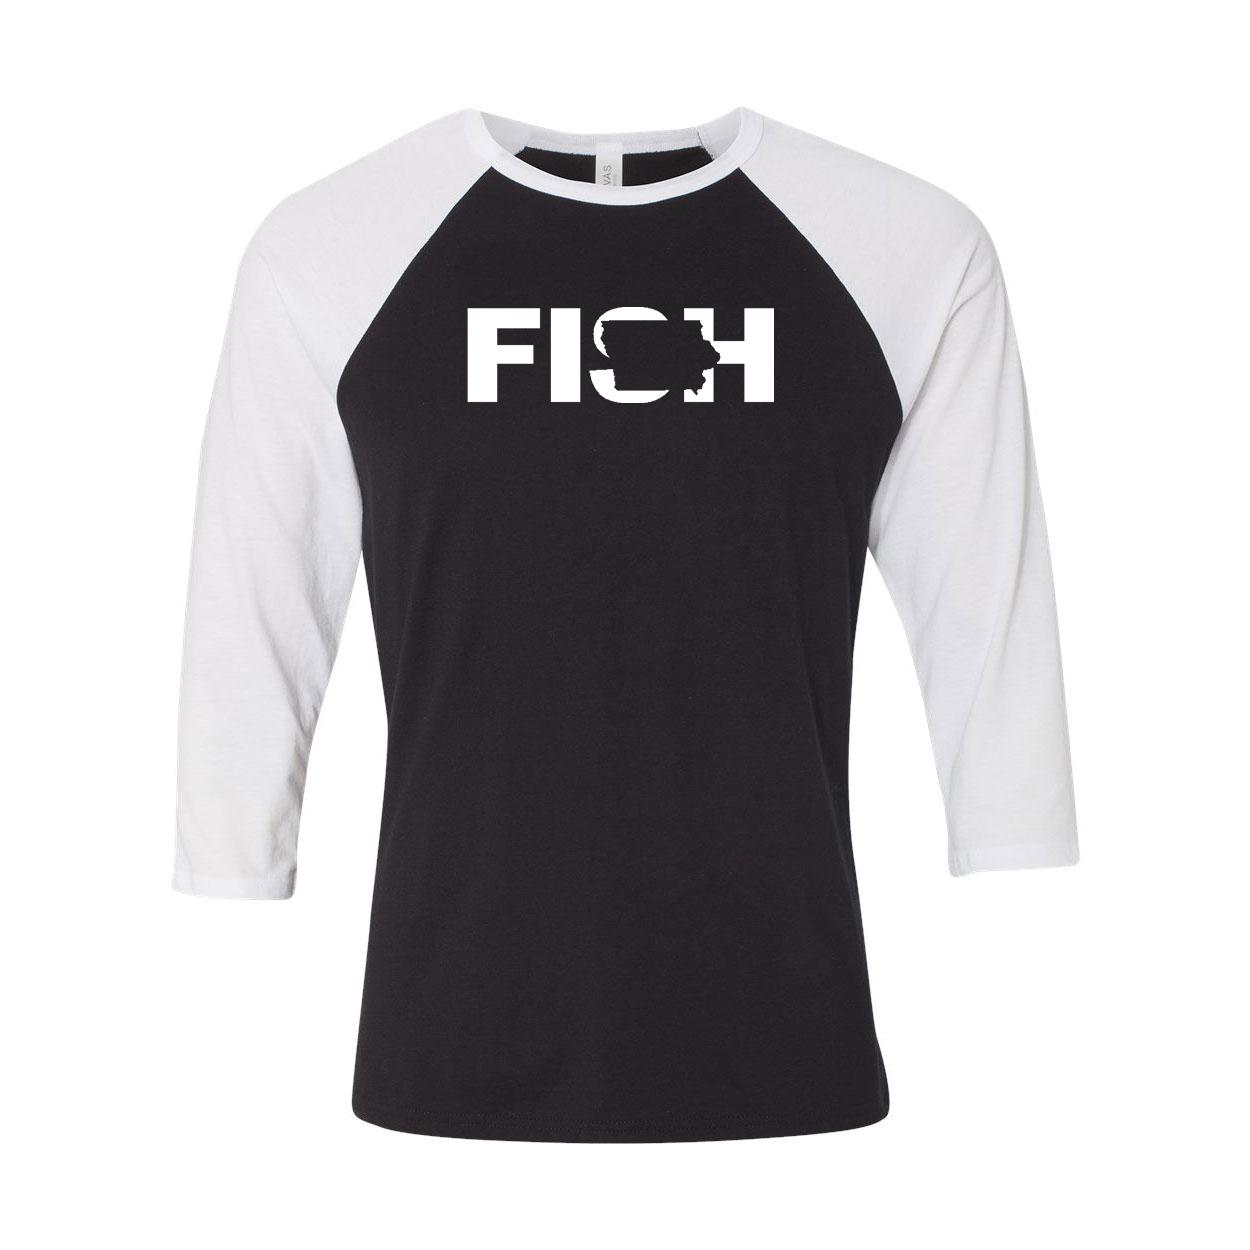 Fish Iowa Classic Raglan Shirt Black/White (White Logo)